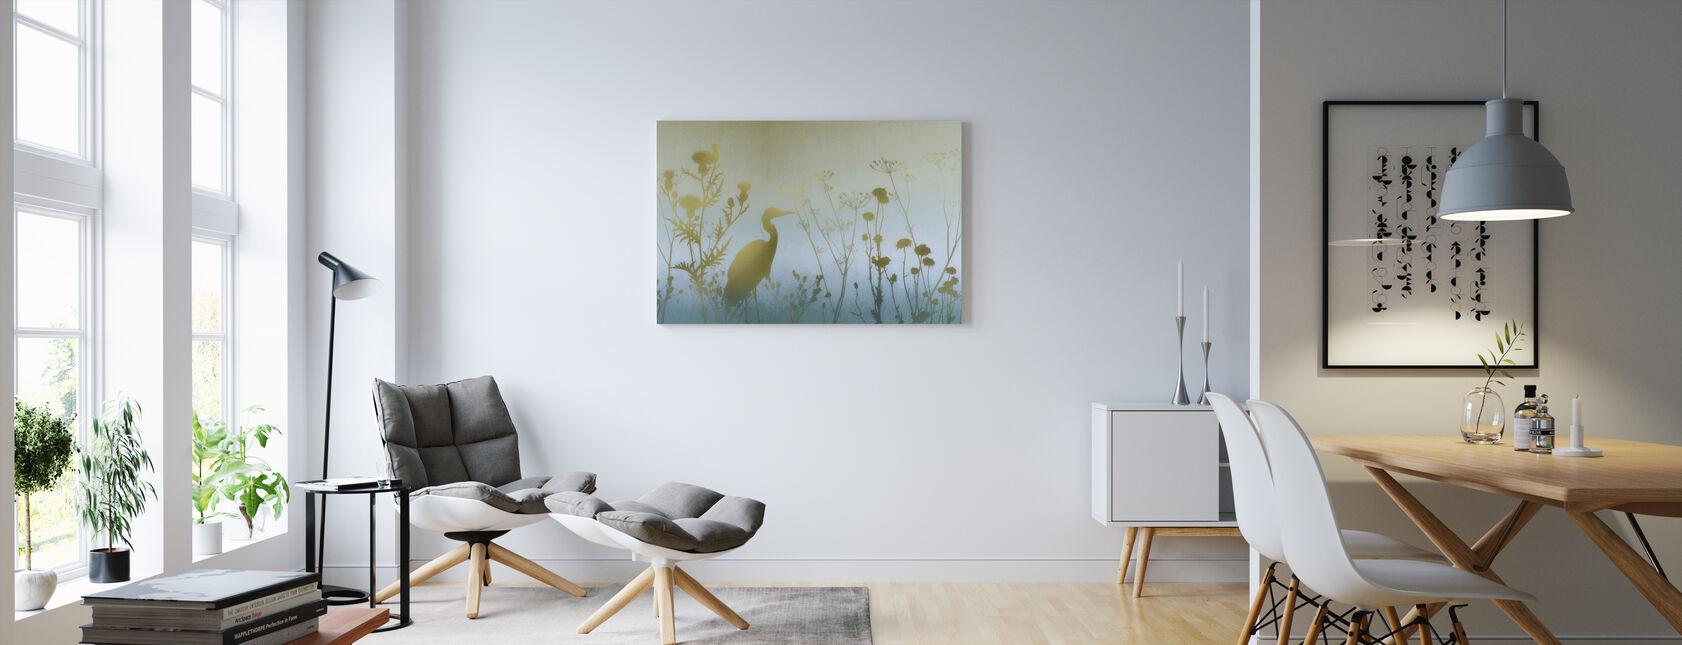 Hazy Dawn Silhouettes - Canvas print - Living Room